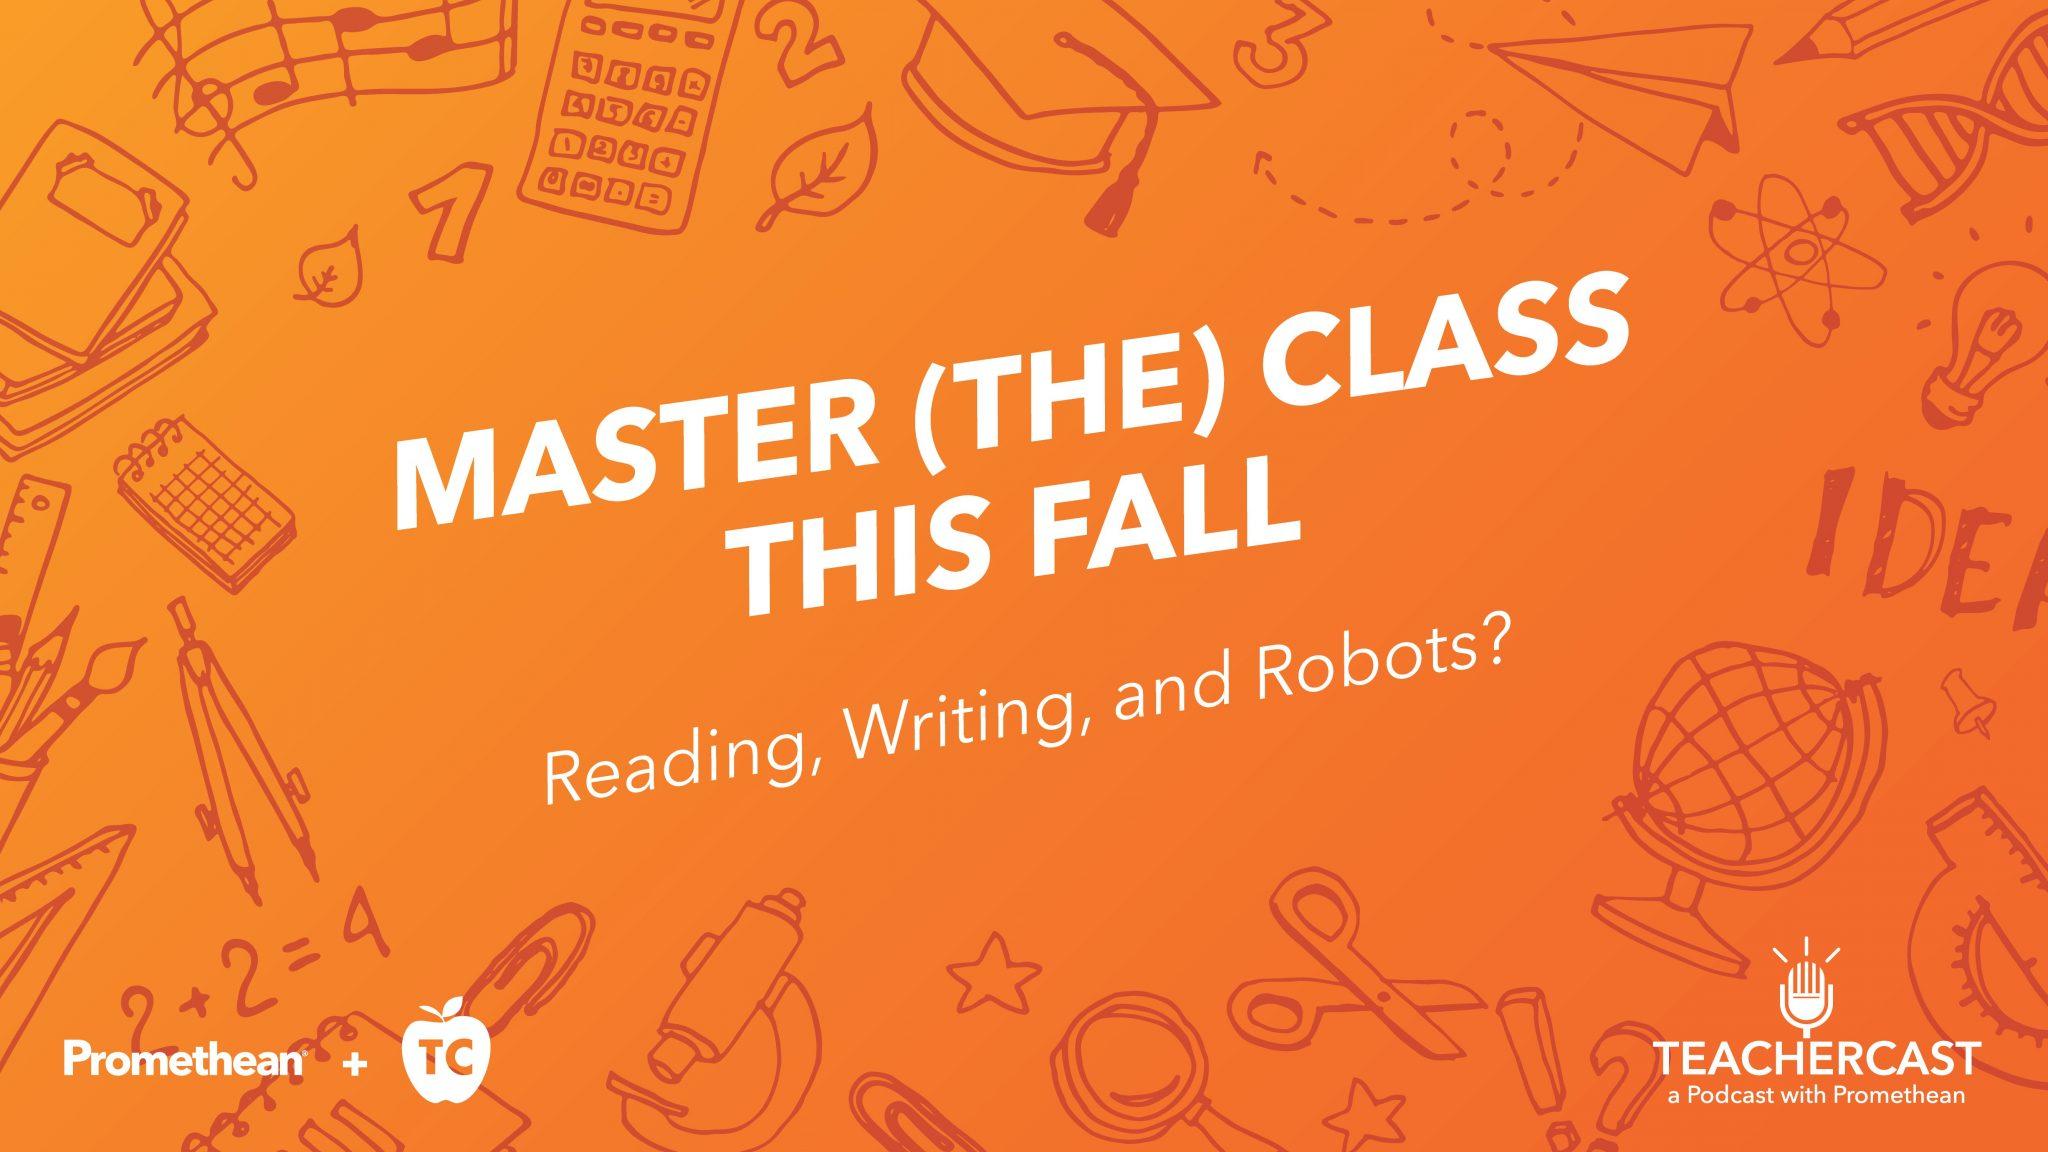 Reading, Writing, Robotics